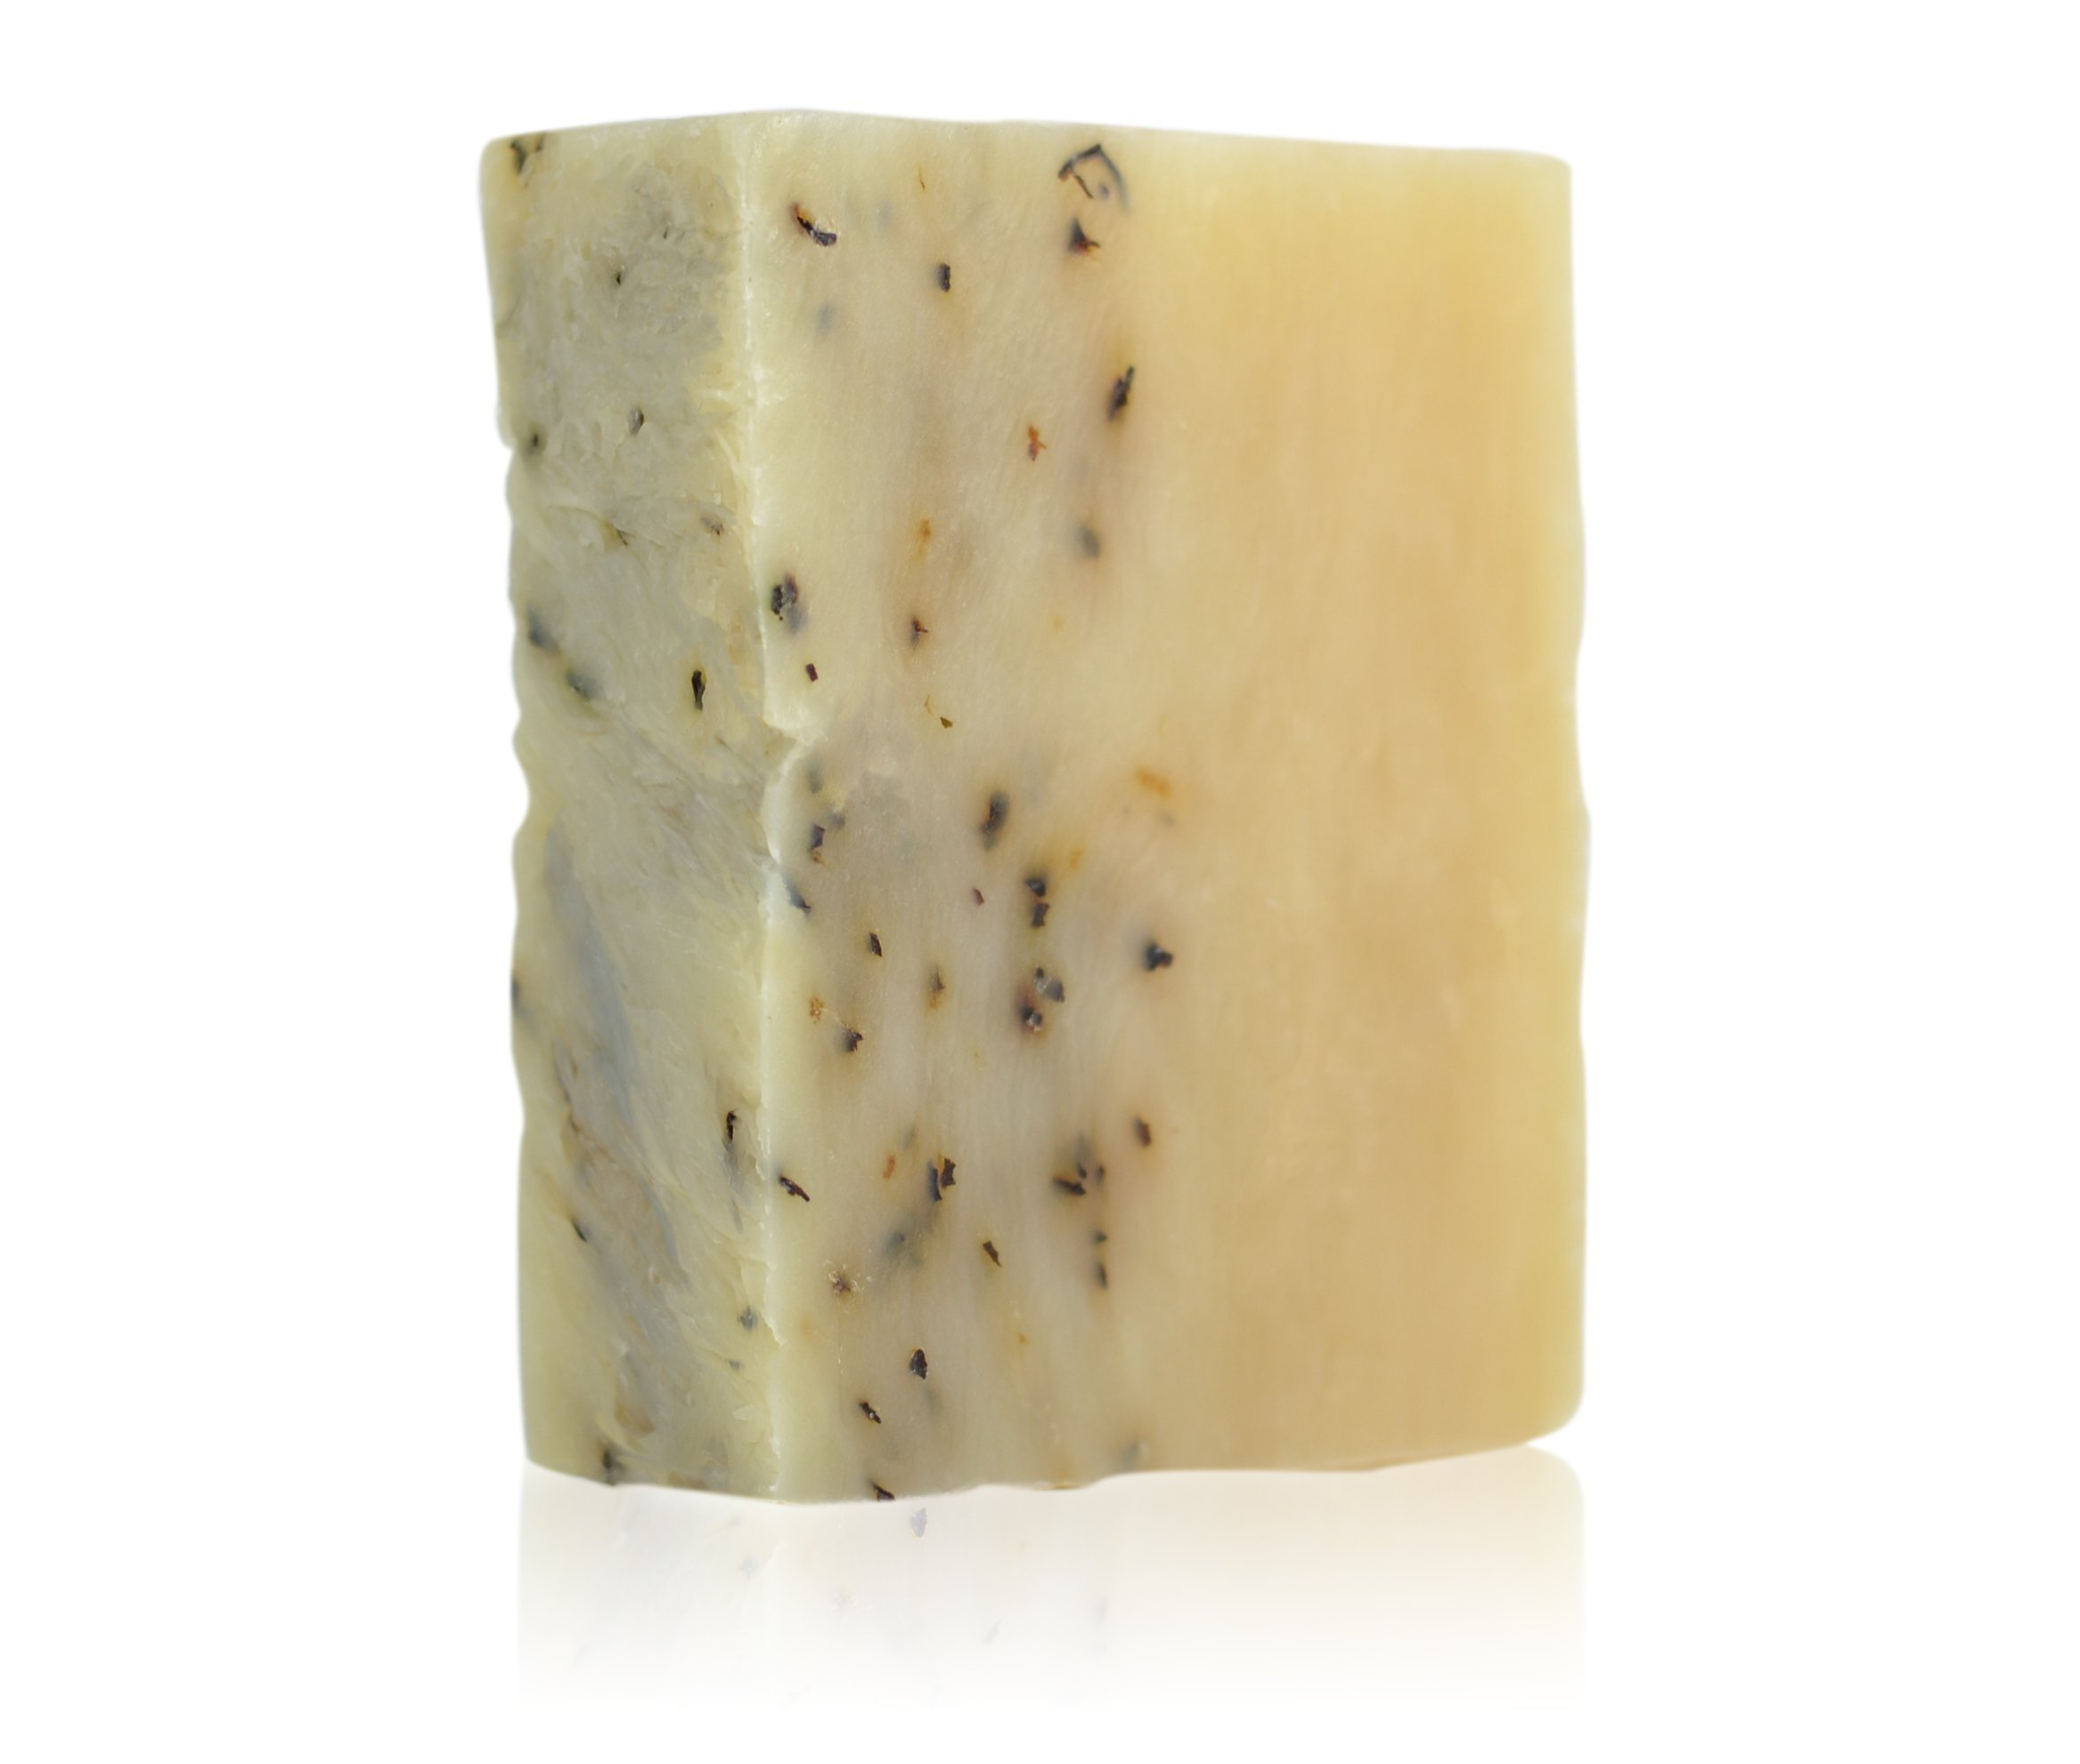 Brickell Men's Mint Soap Scrub Bar for Men– 4 oz – Natural & Organic